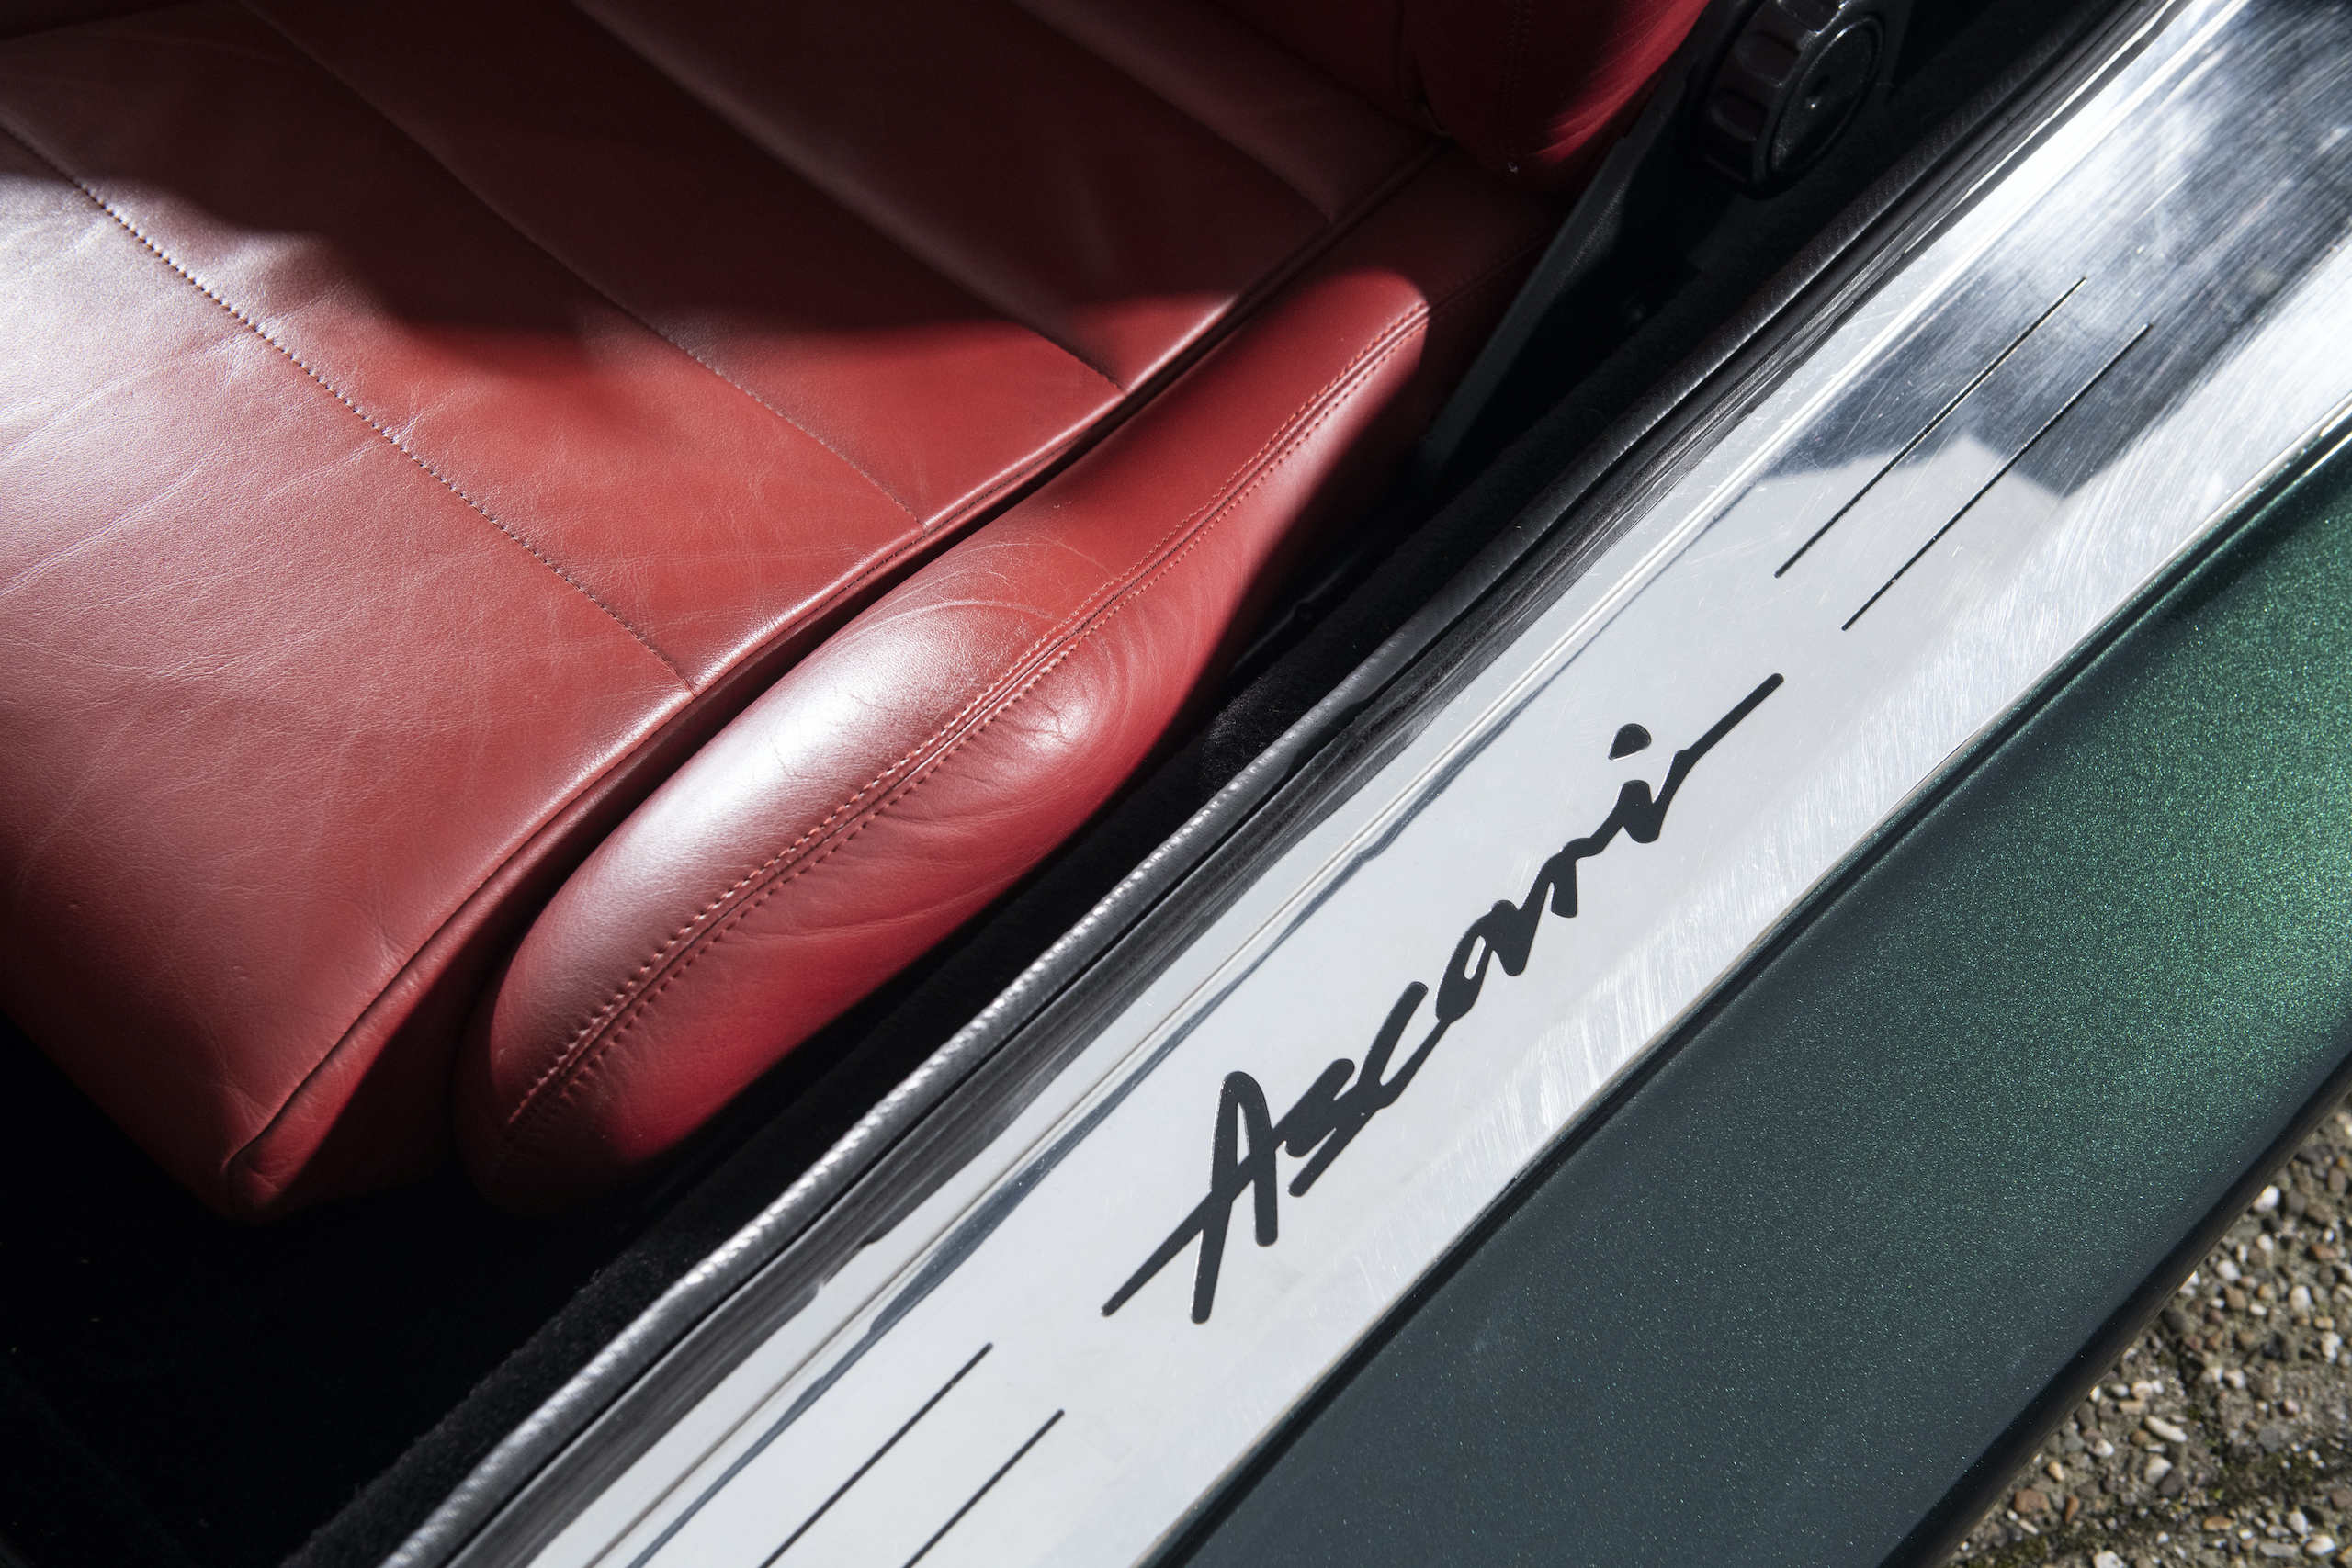 1997 Ascari Ecosse door sill detail